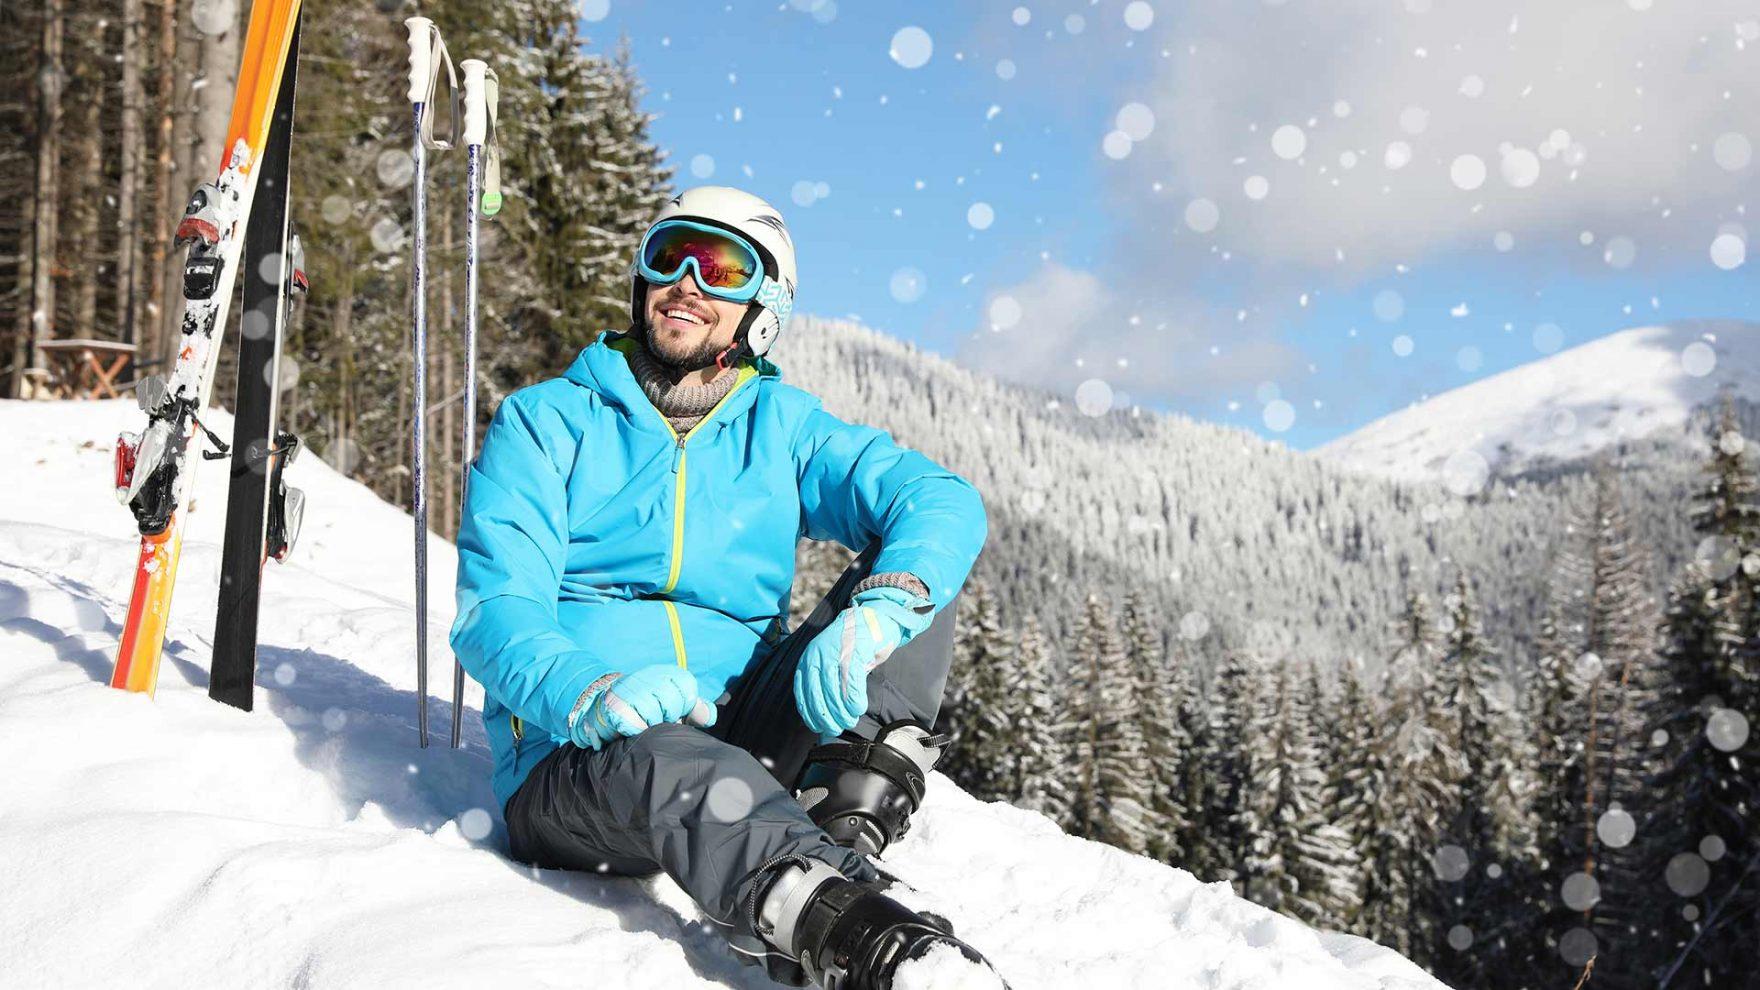 Skiurlaub genießen